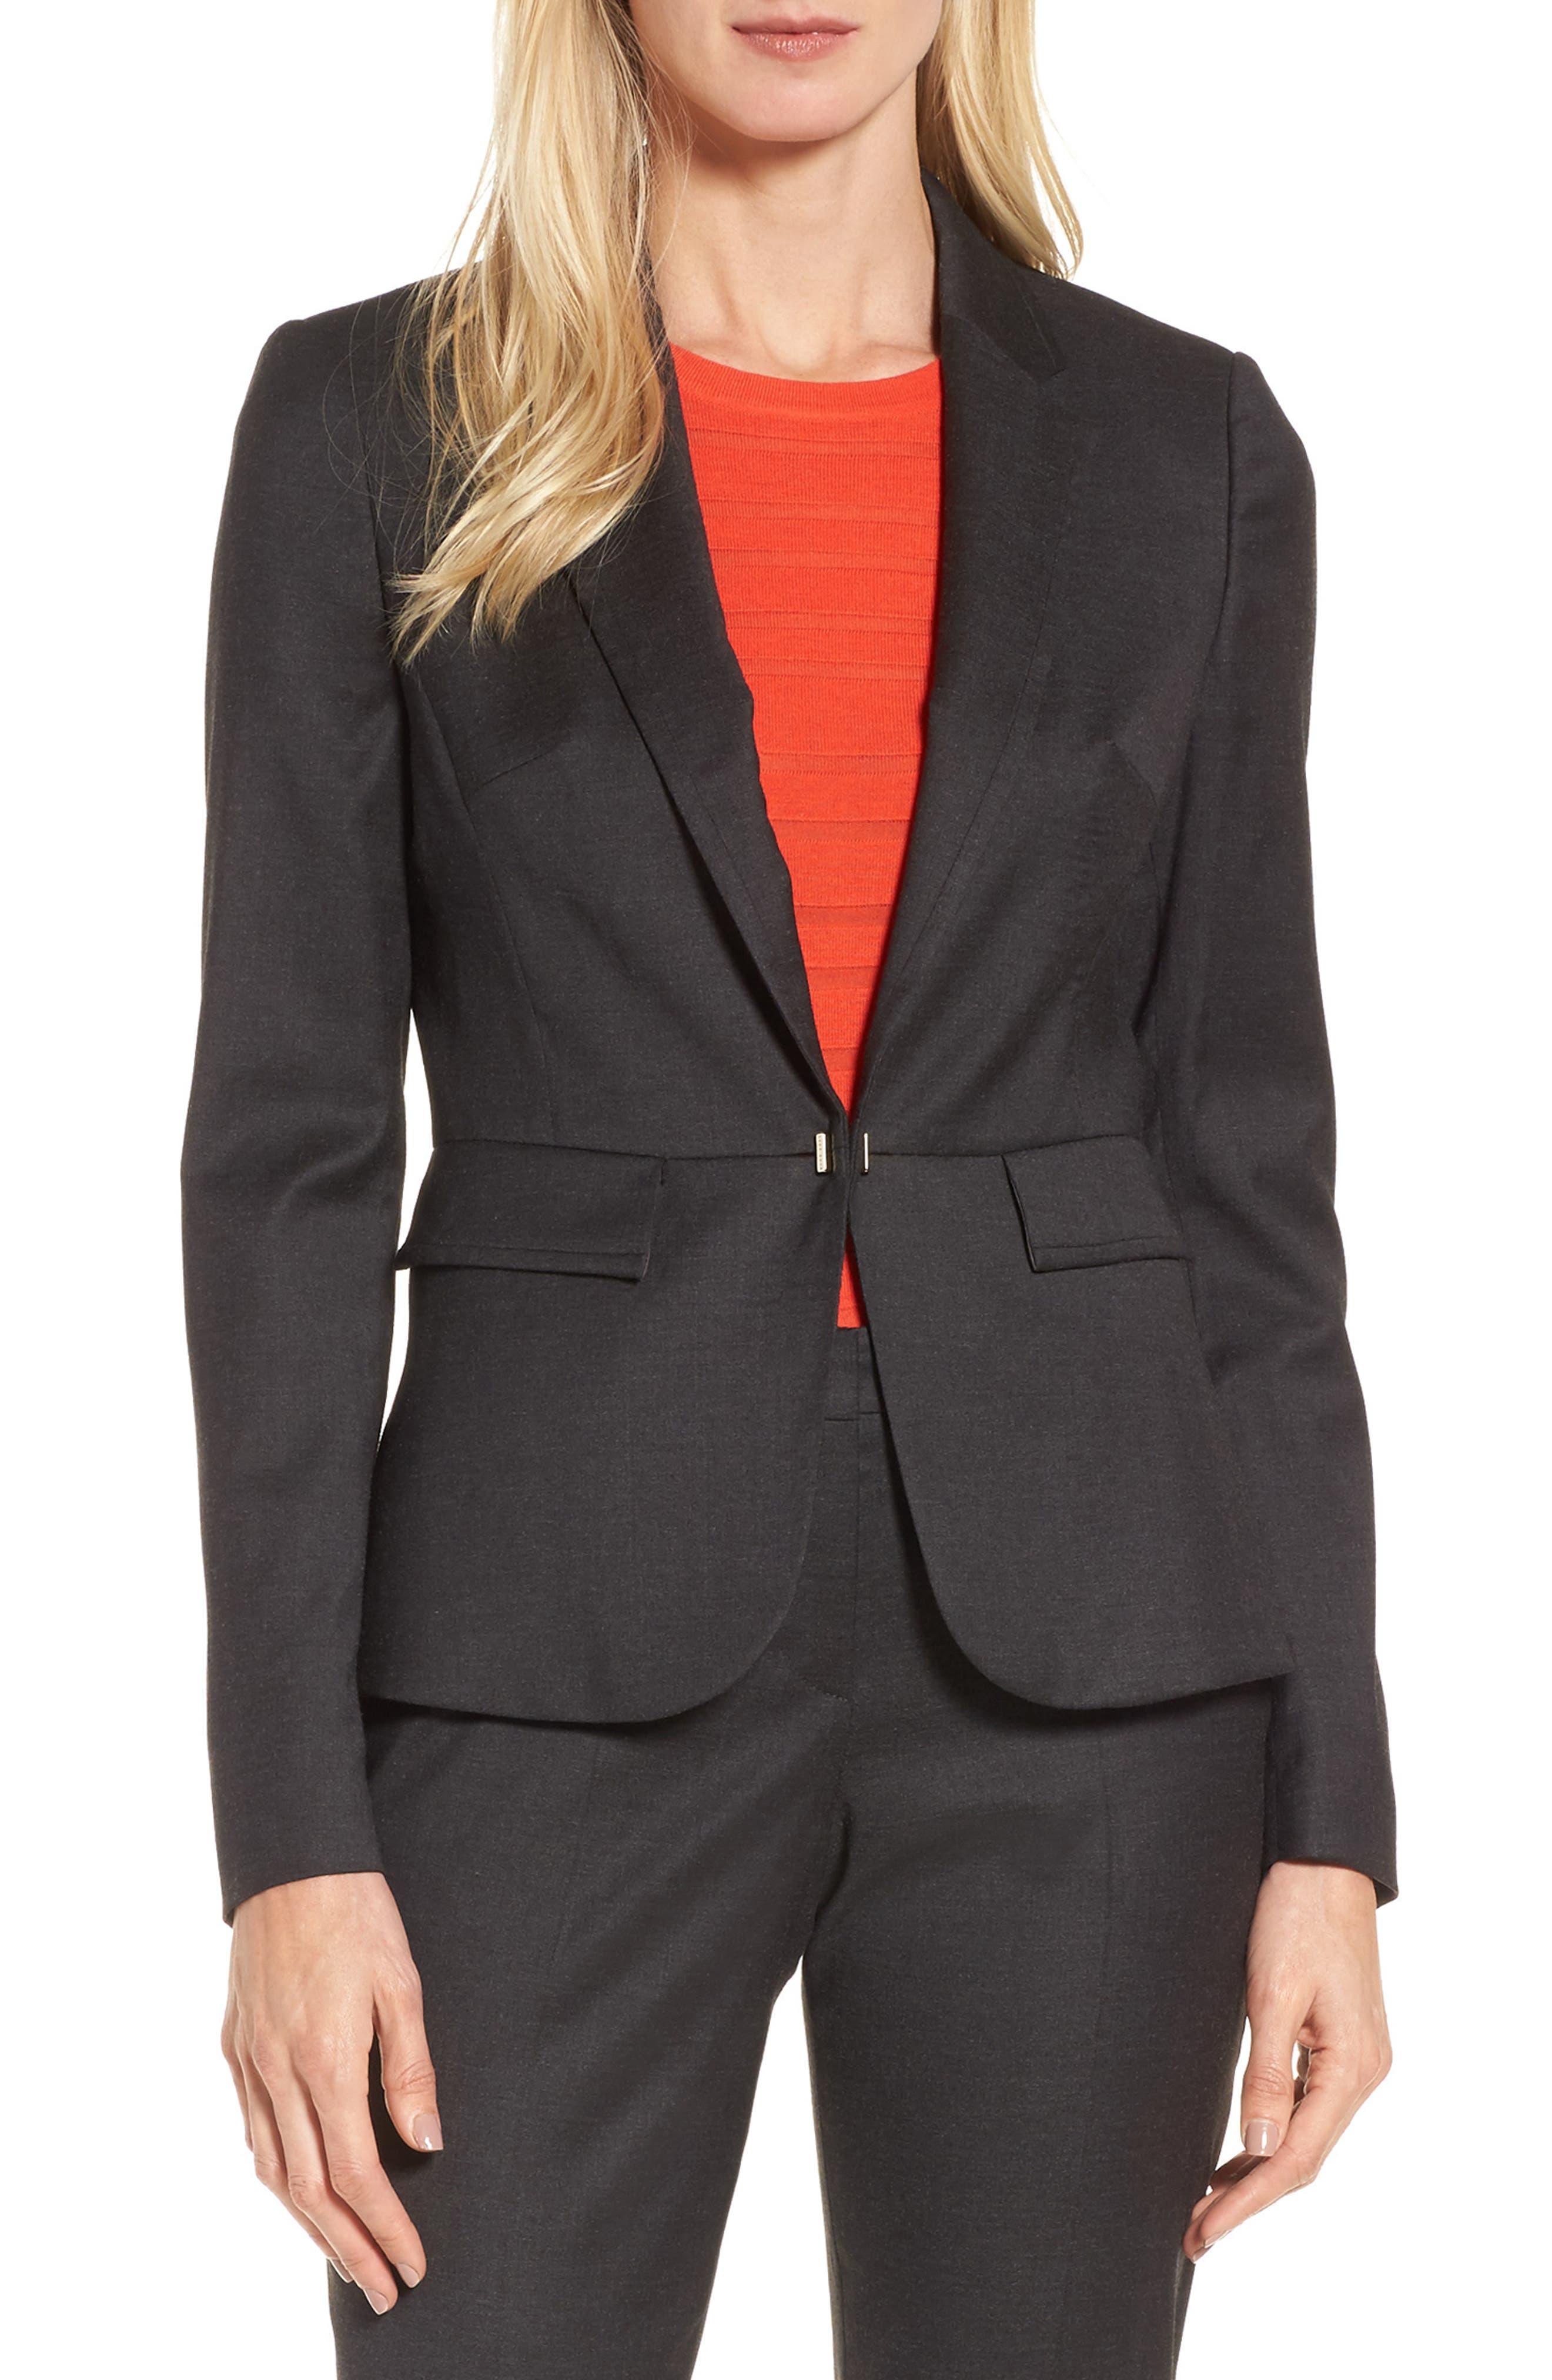 BOSS Jafilia Wool Blend Suit Jacket